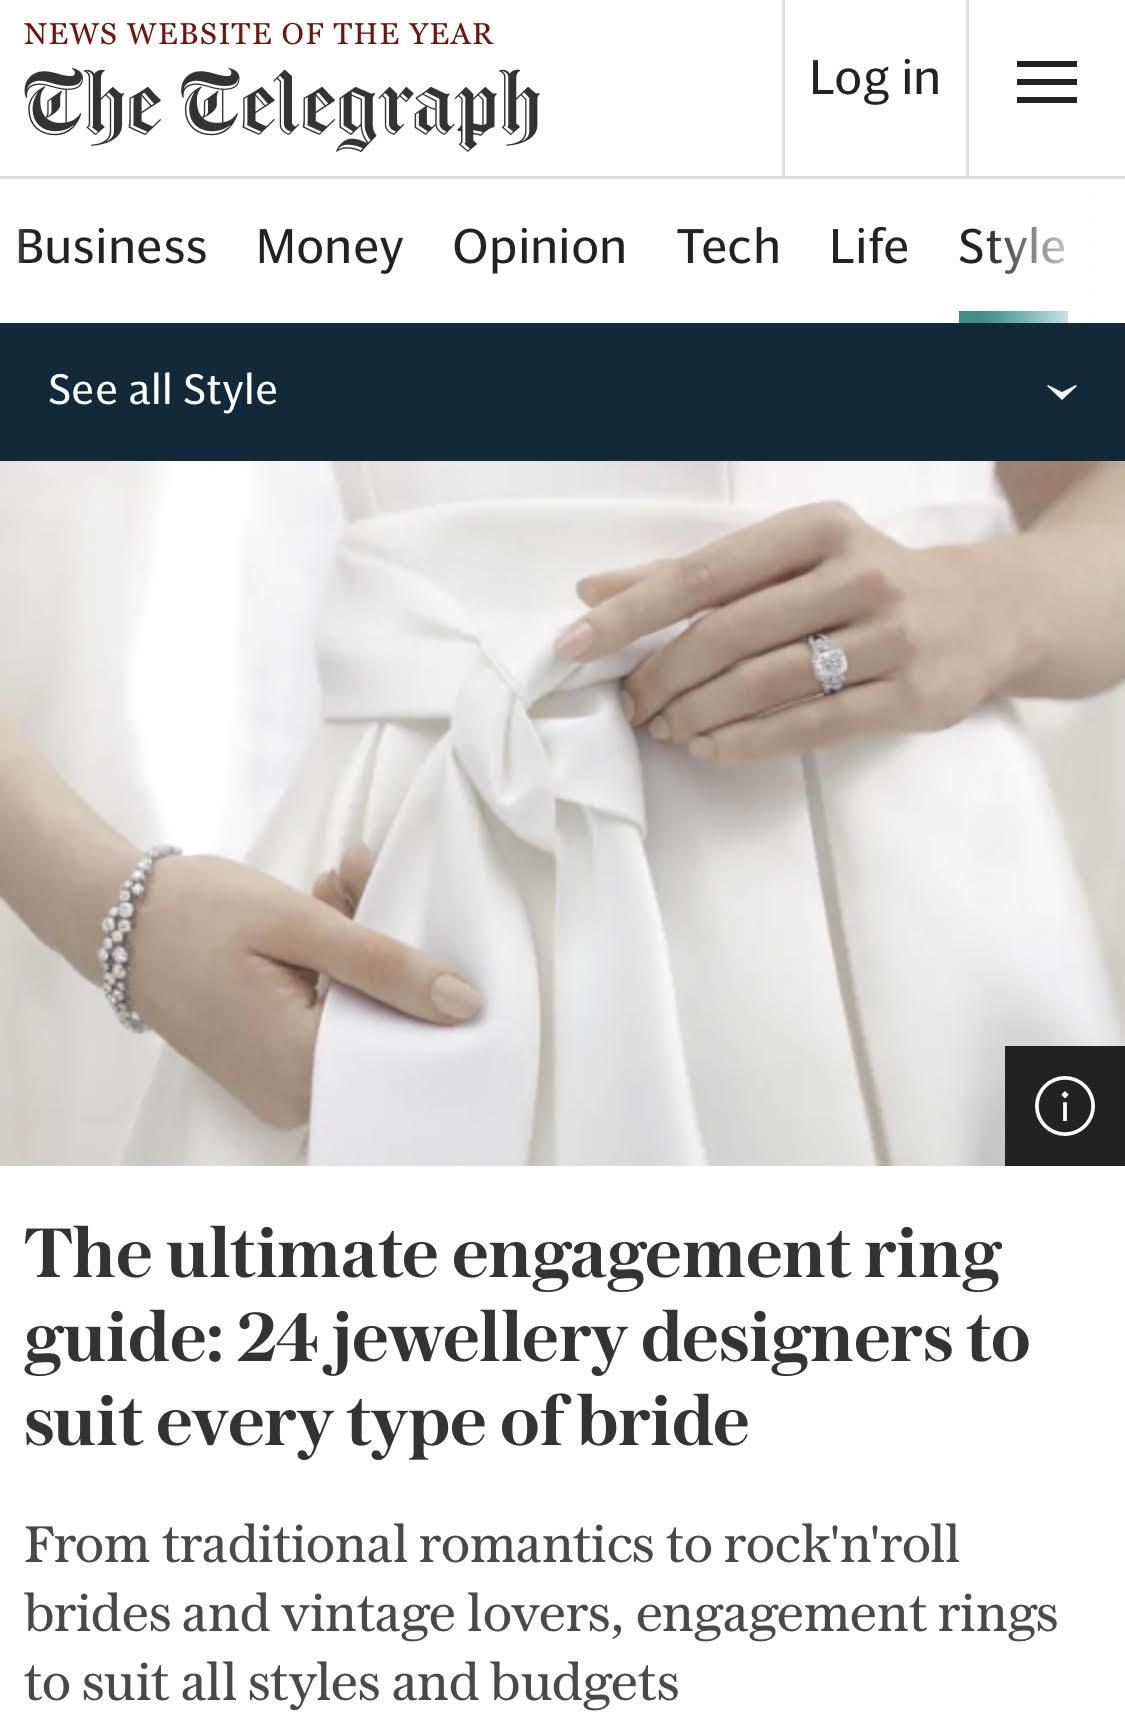 TELEGRAPH LUXURY: 24 JEWELLERY DESIGNERS TO SUIT EVERY TYPE OF BRIDE